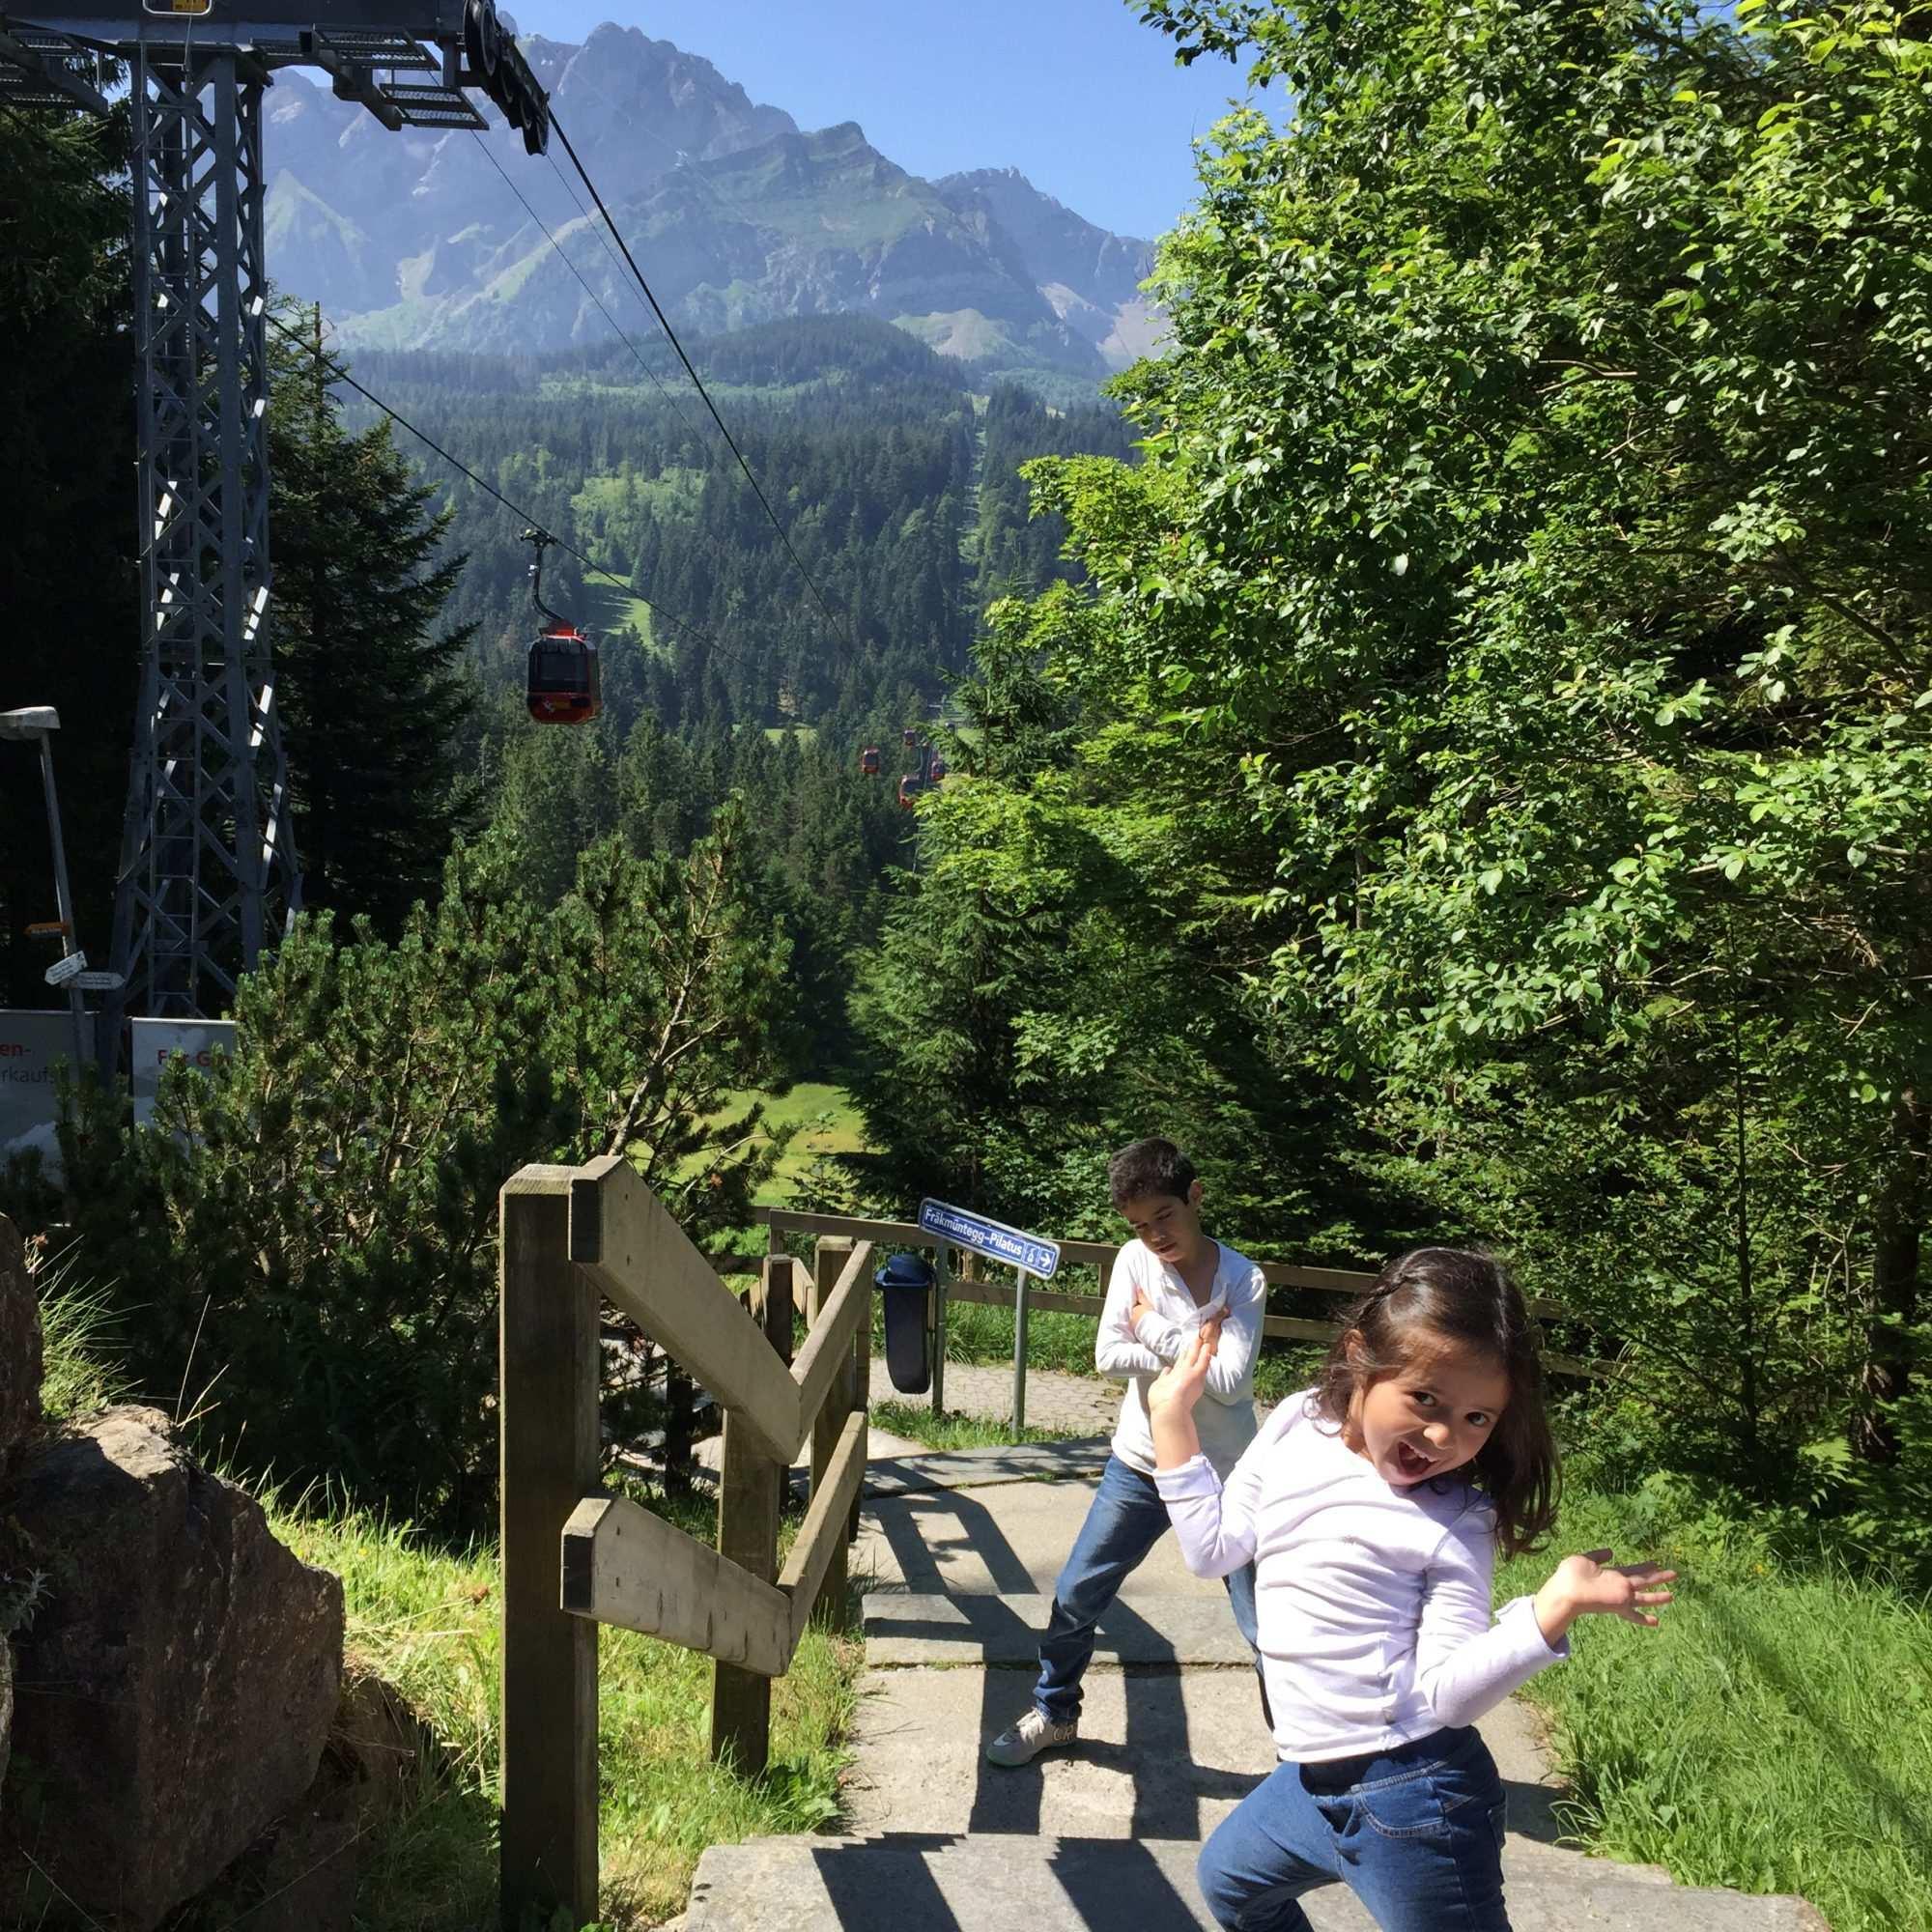 A doce e linda Suíça